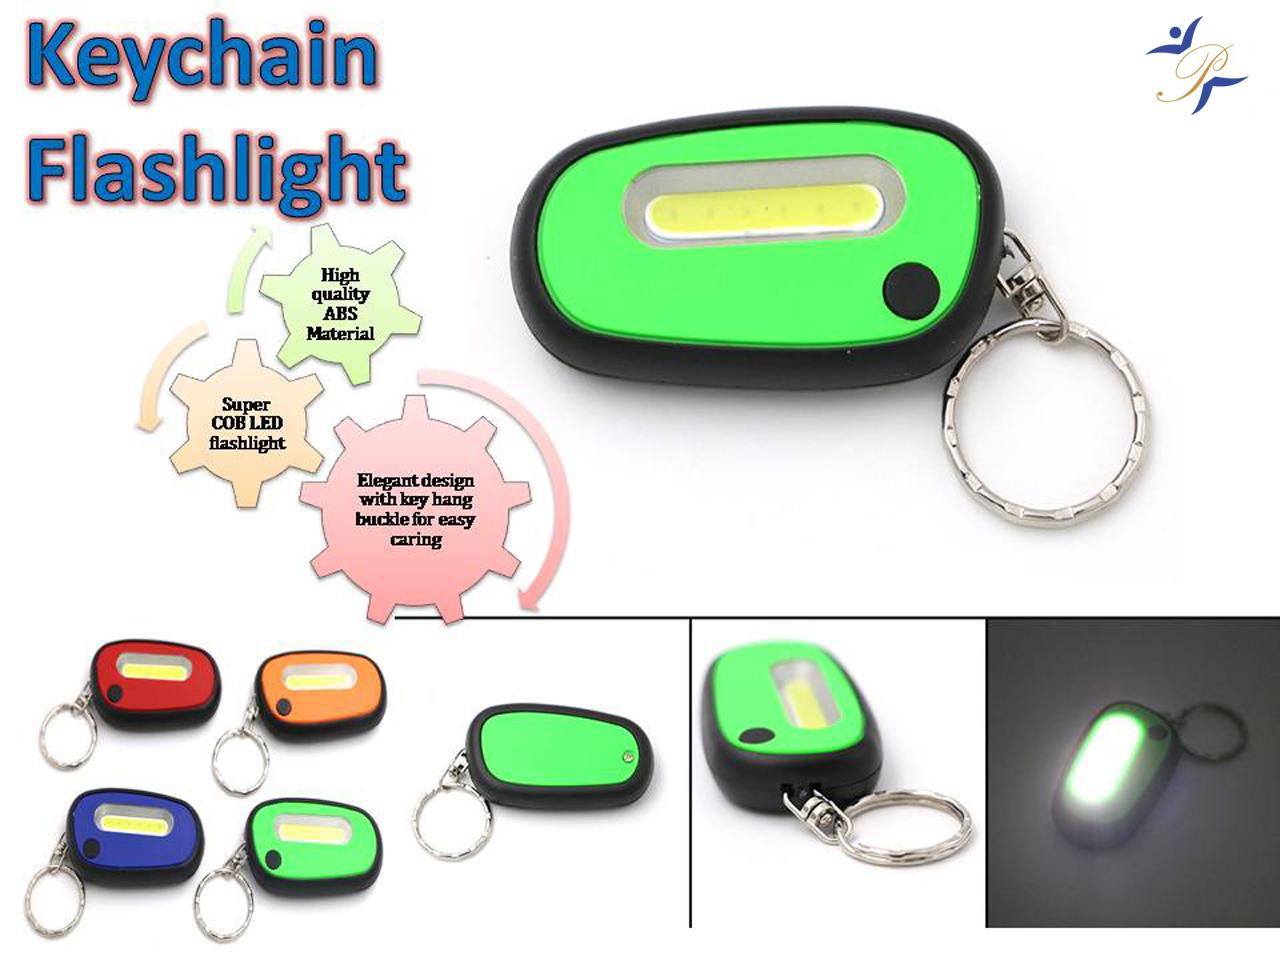 5828 keychain